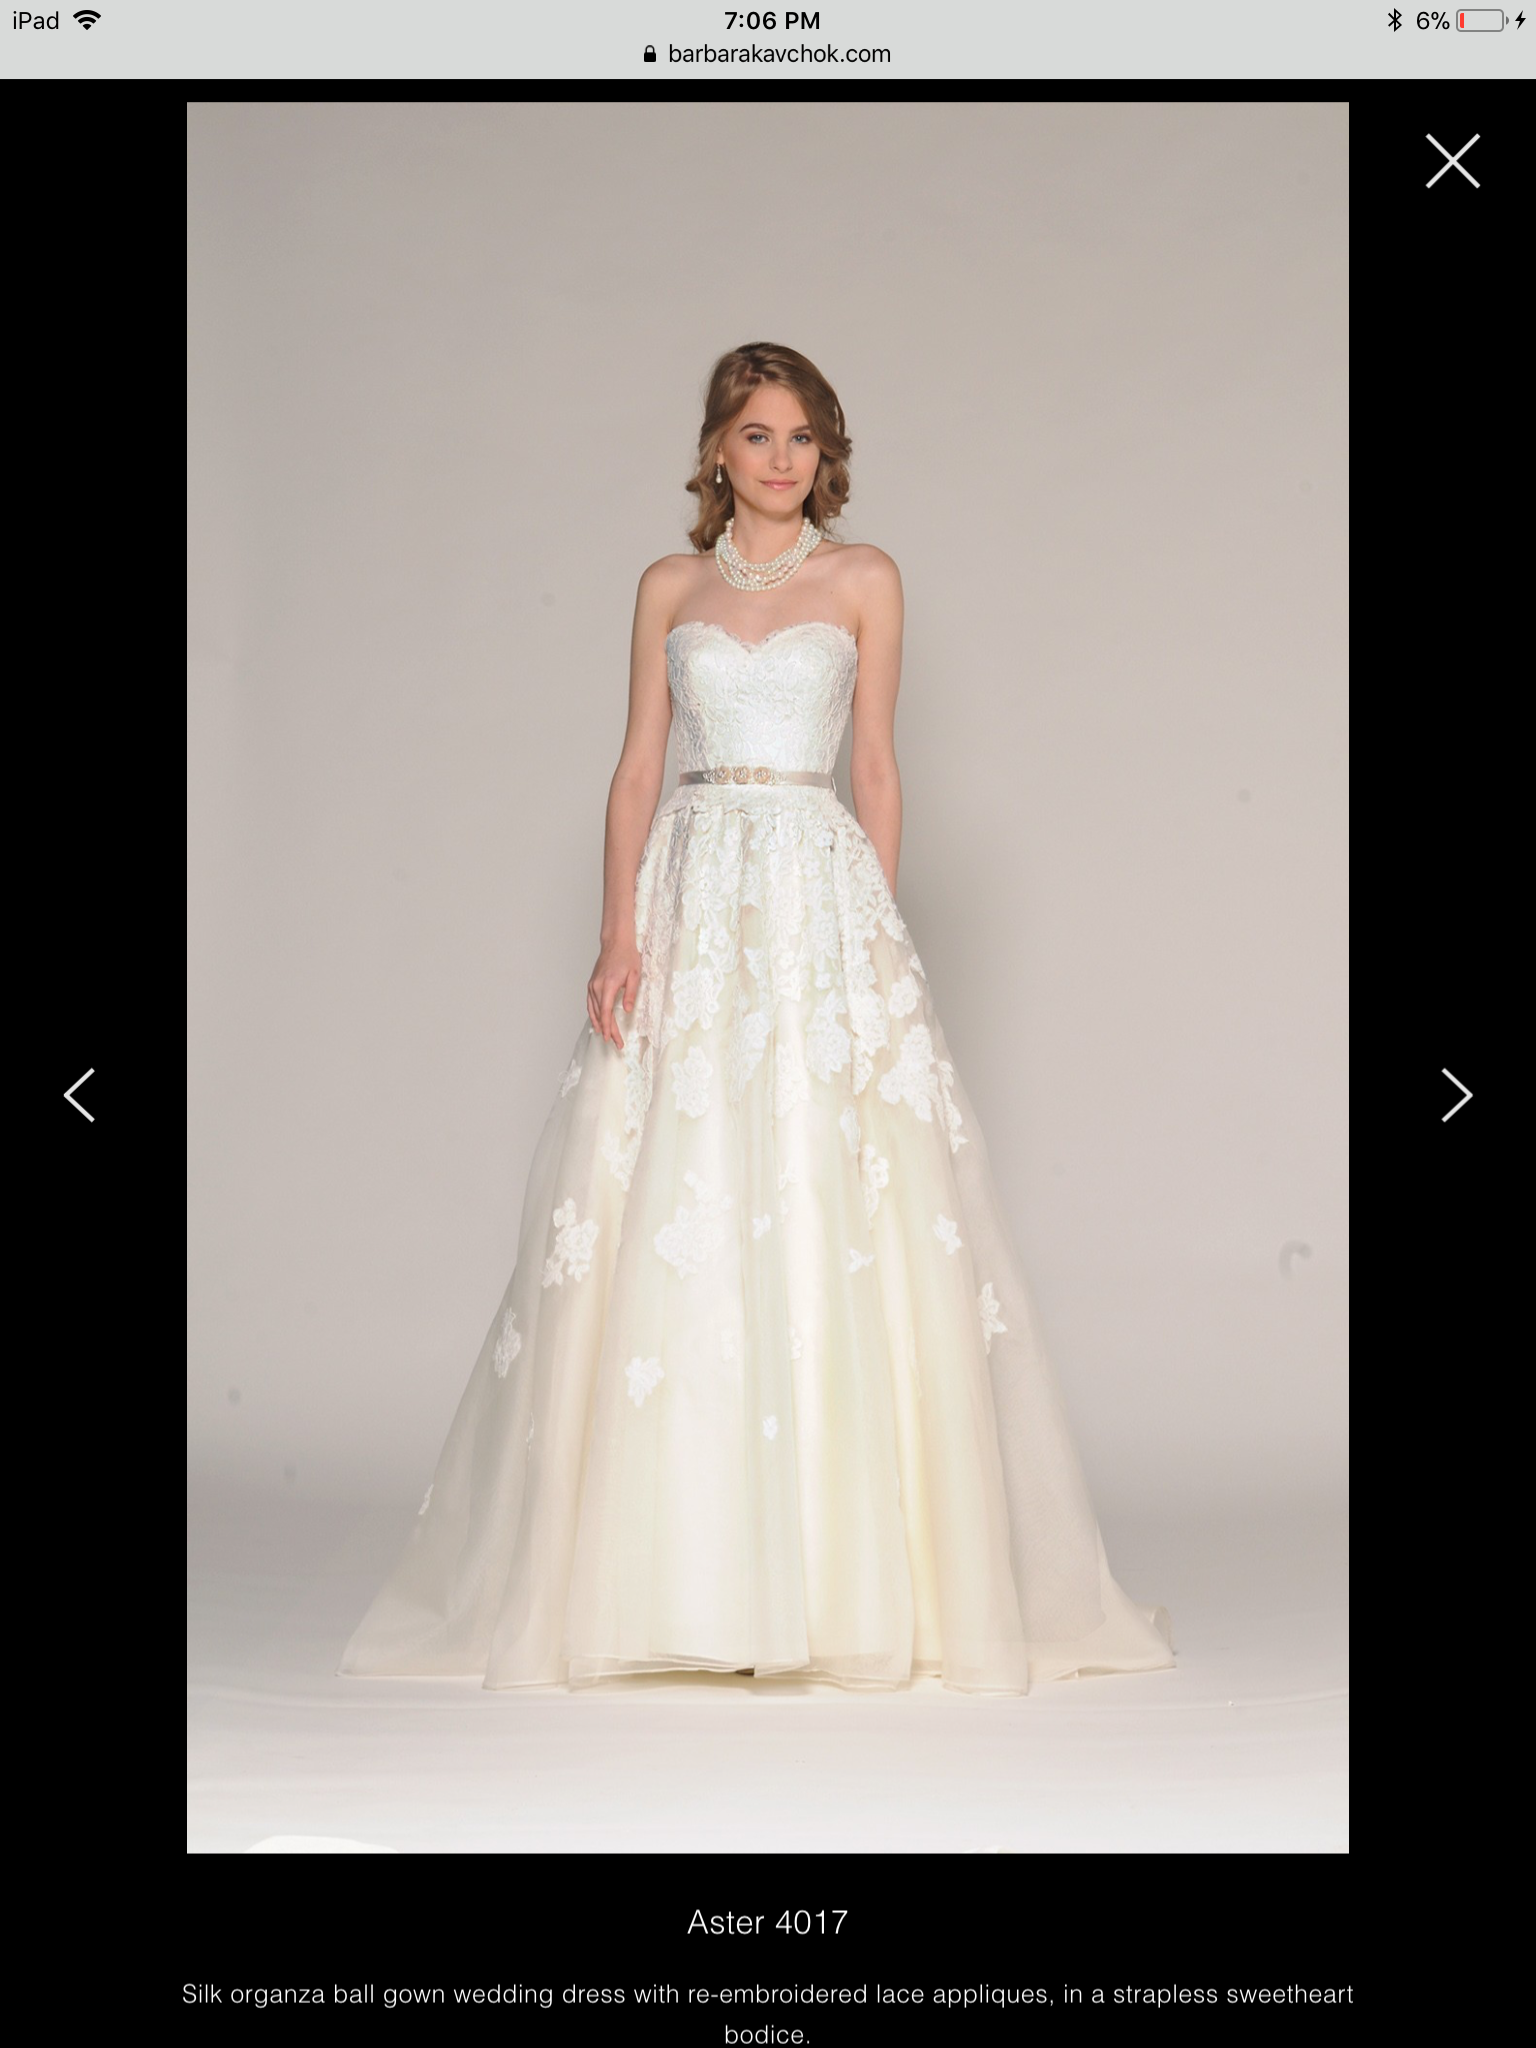 dfbc4b414df Pin by Melodie Freeman on Wedding dress ideas